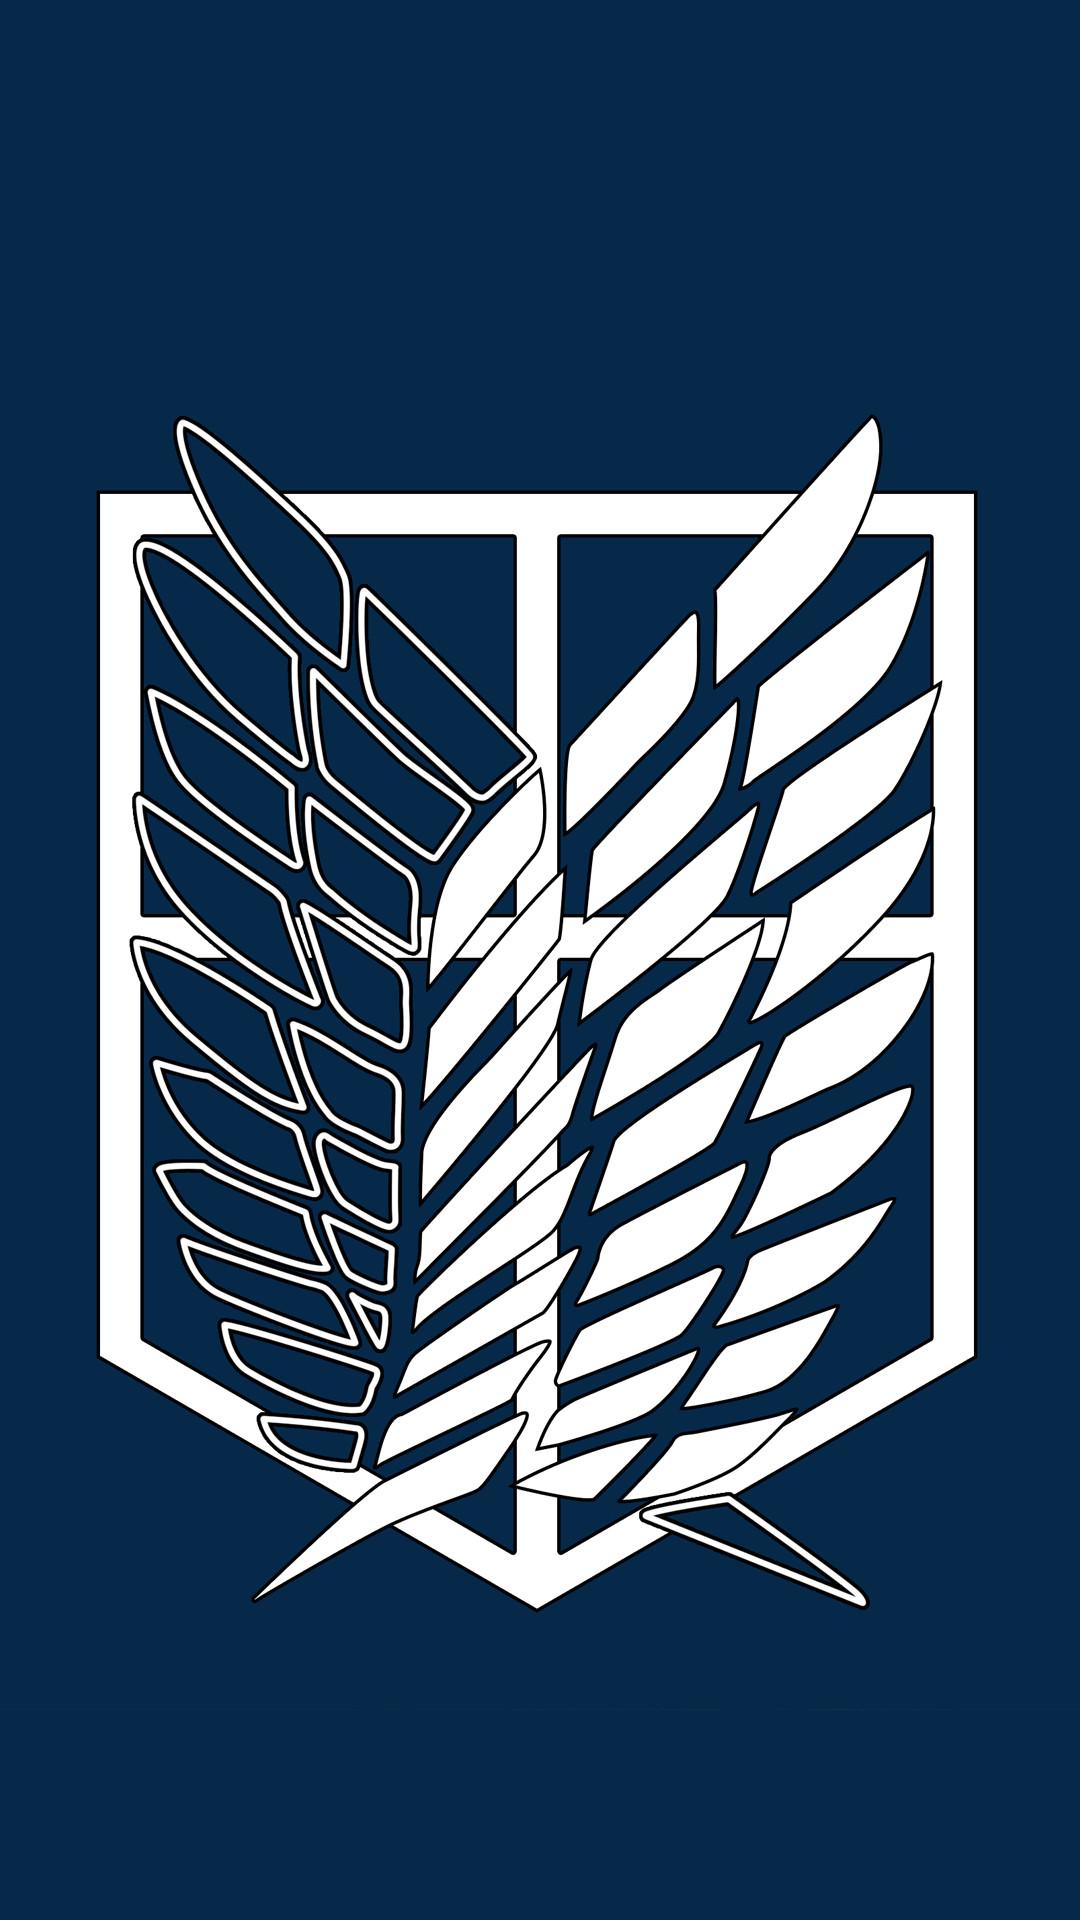 Survey Corps Logo Wallpaper Hd